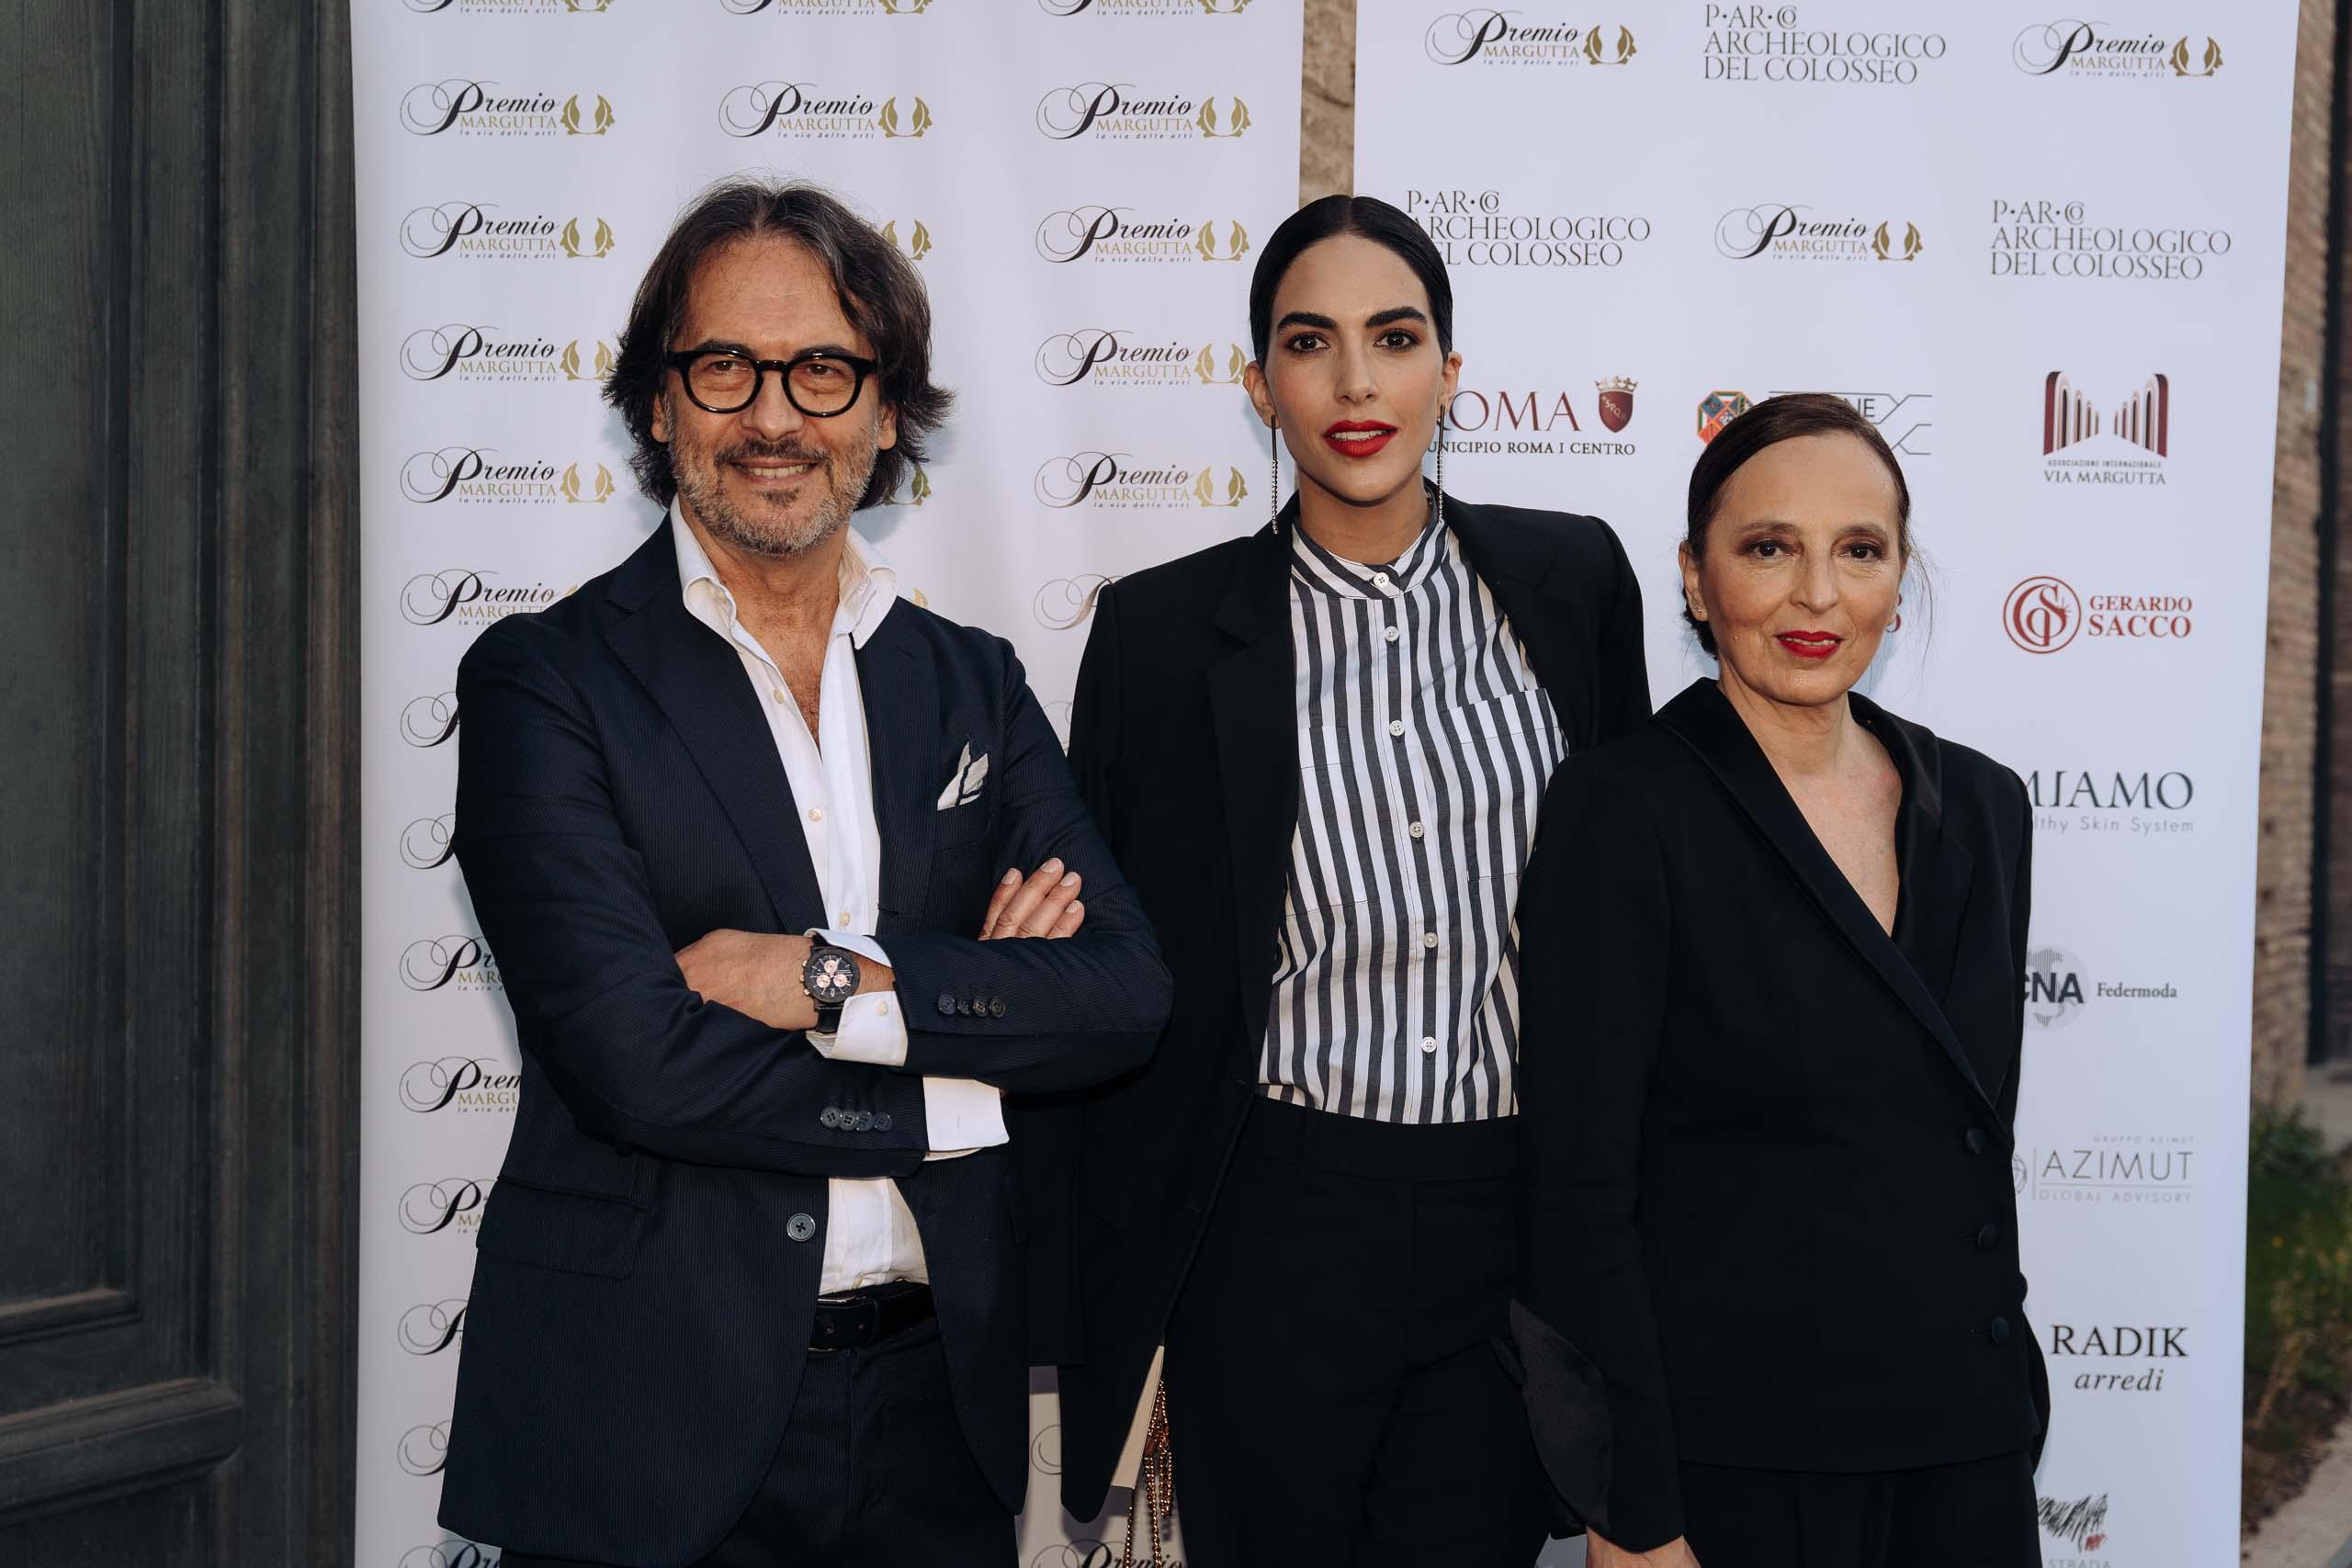 3 Antonio Falanga - Rocio Munoz Morales - Grazia Marino